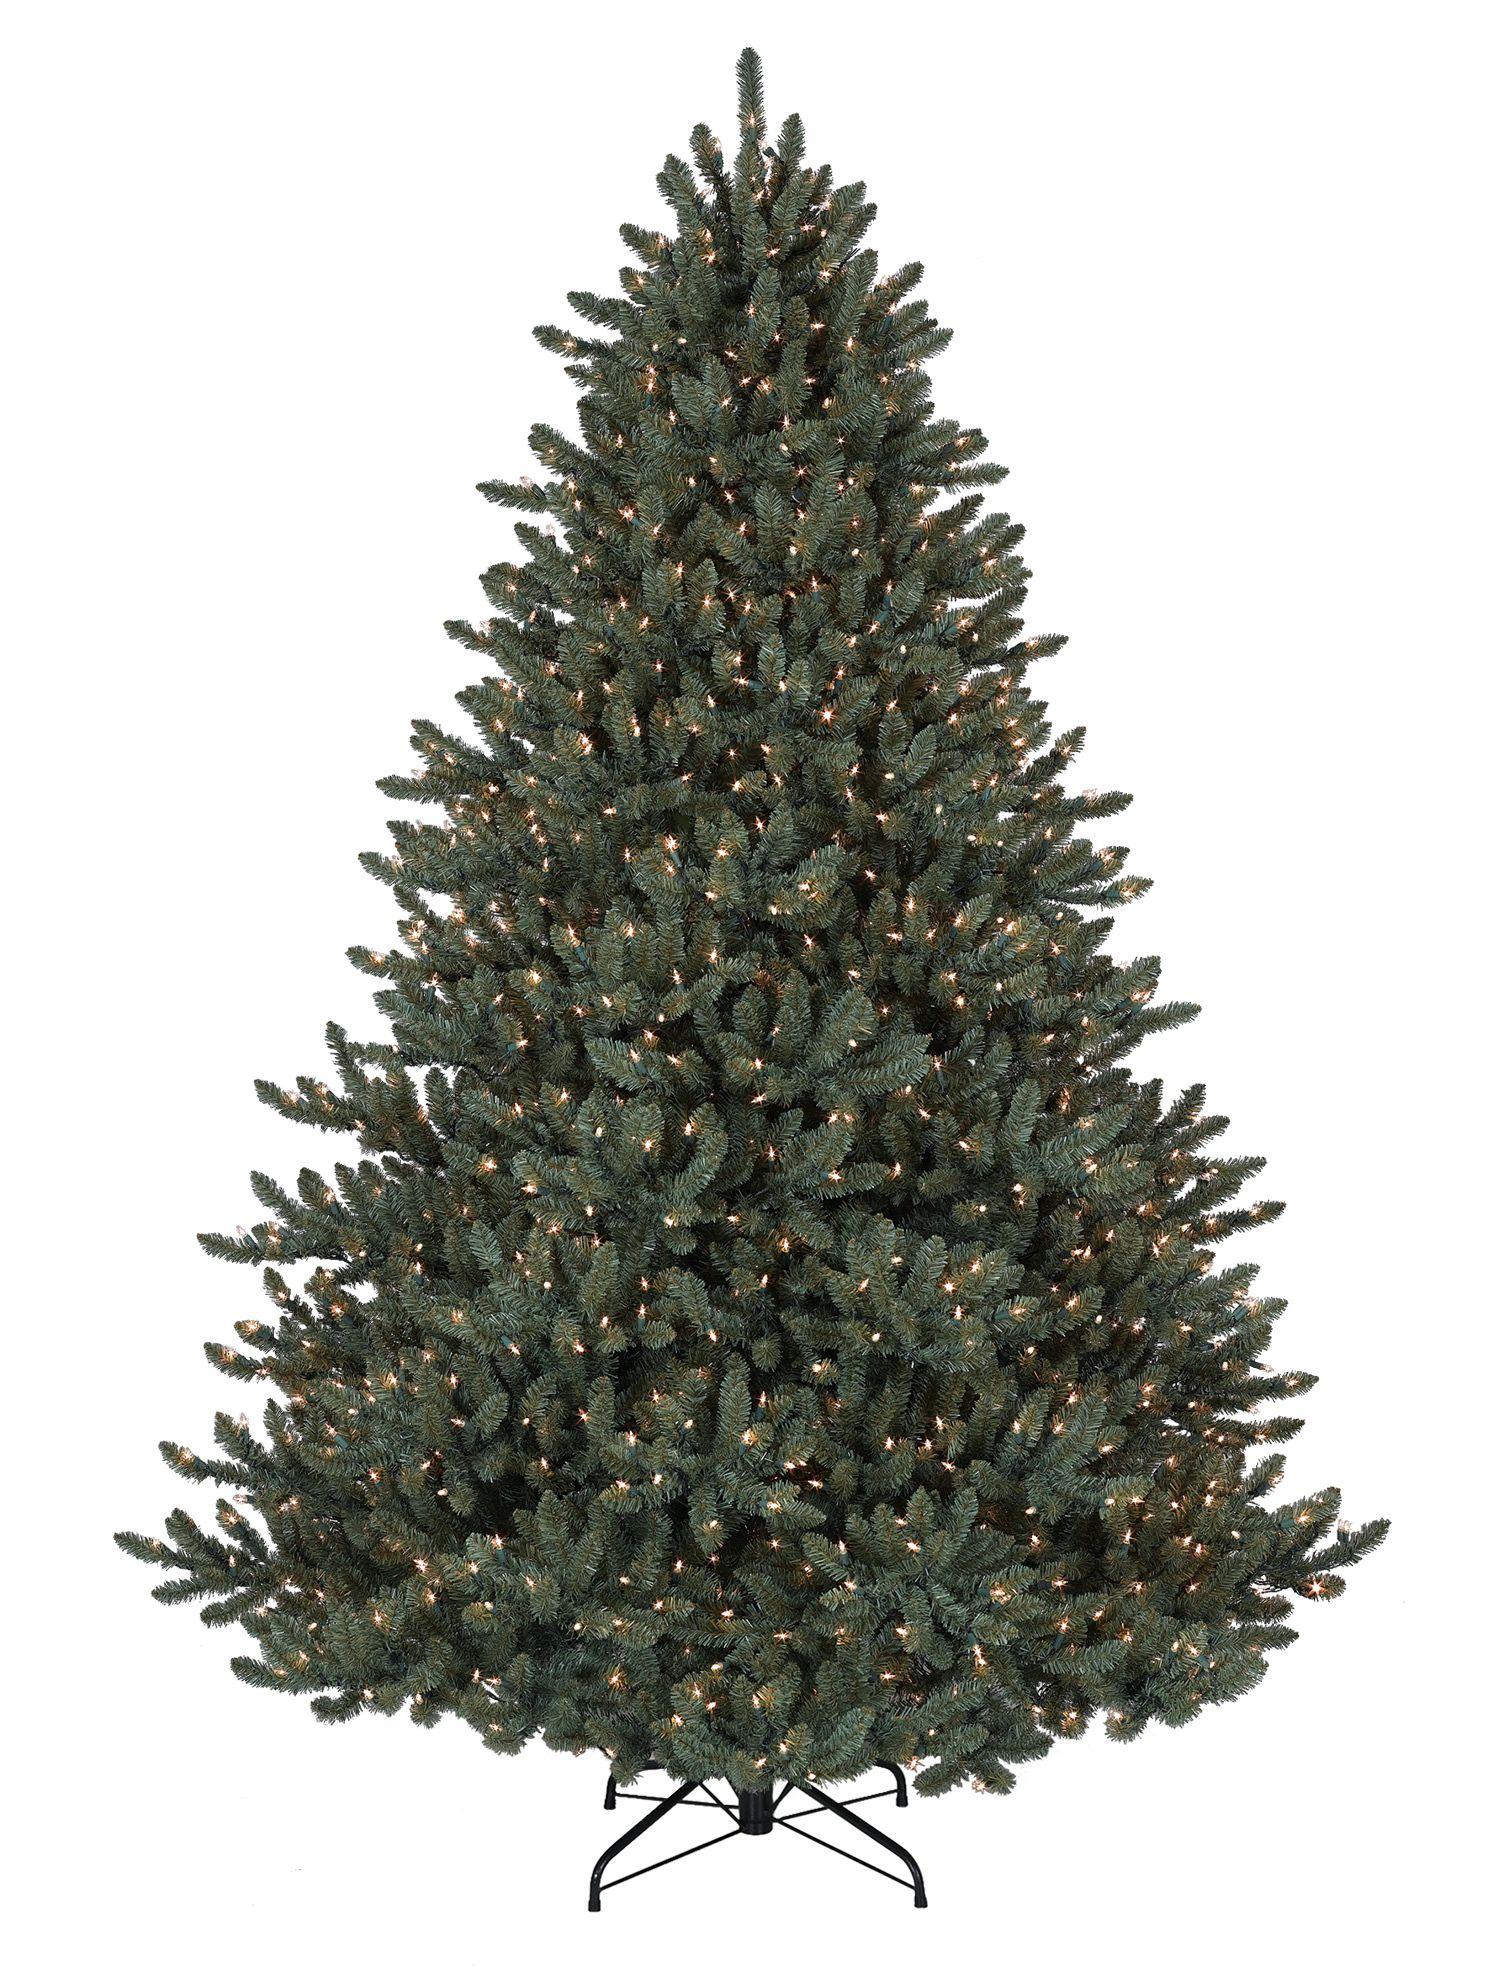 blue spruce artificial christmas tree balsam hill reviews look good looking - Artificial Christmas Tree Reviews